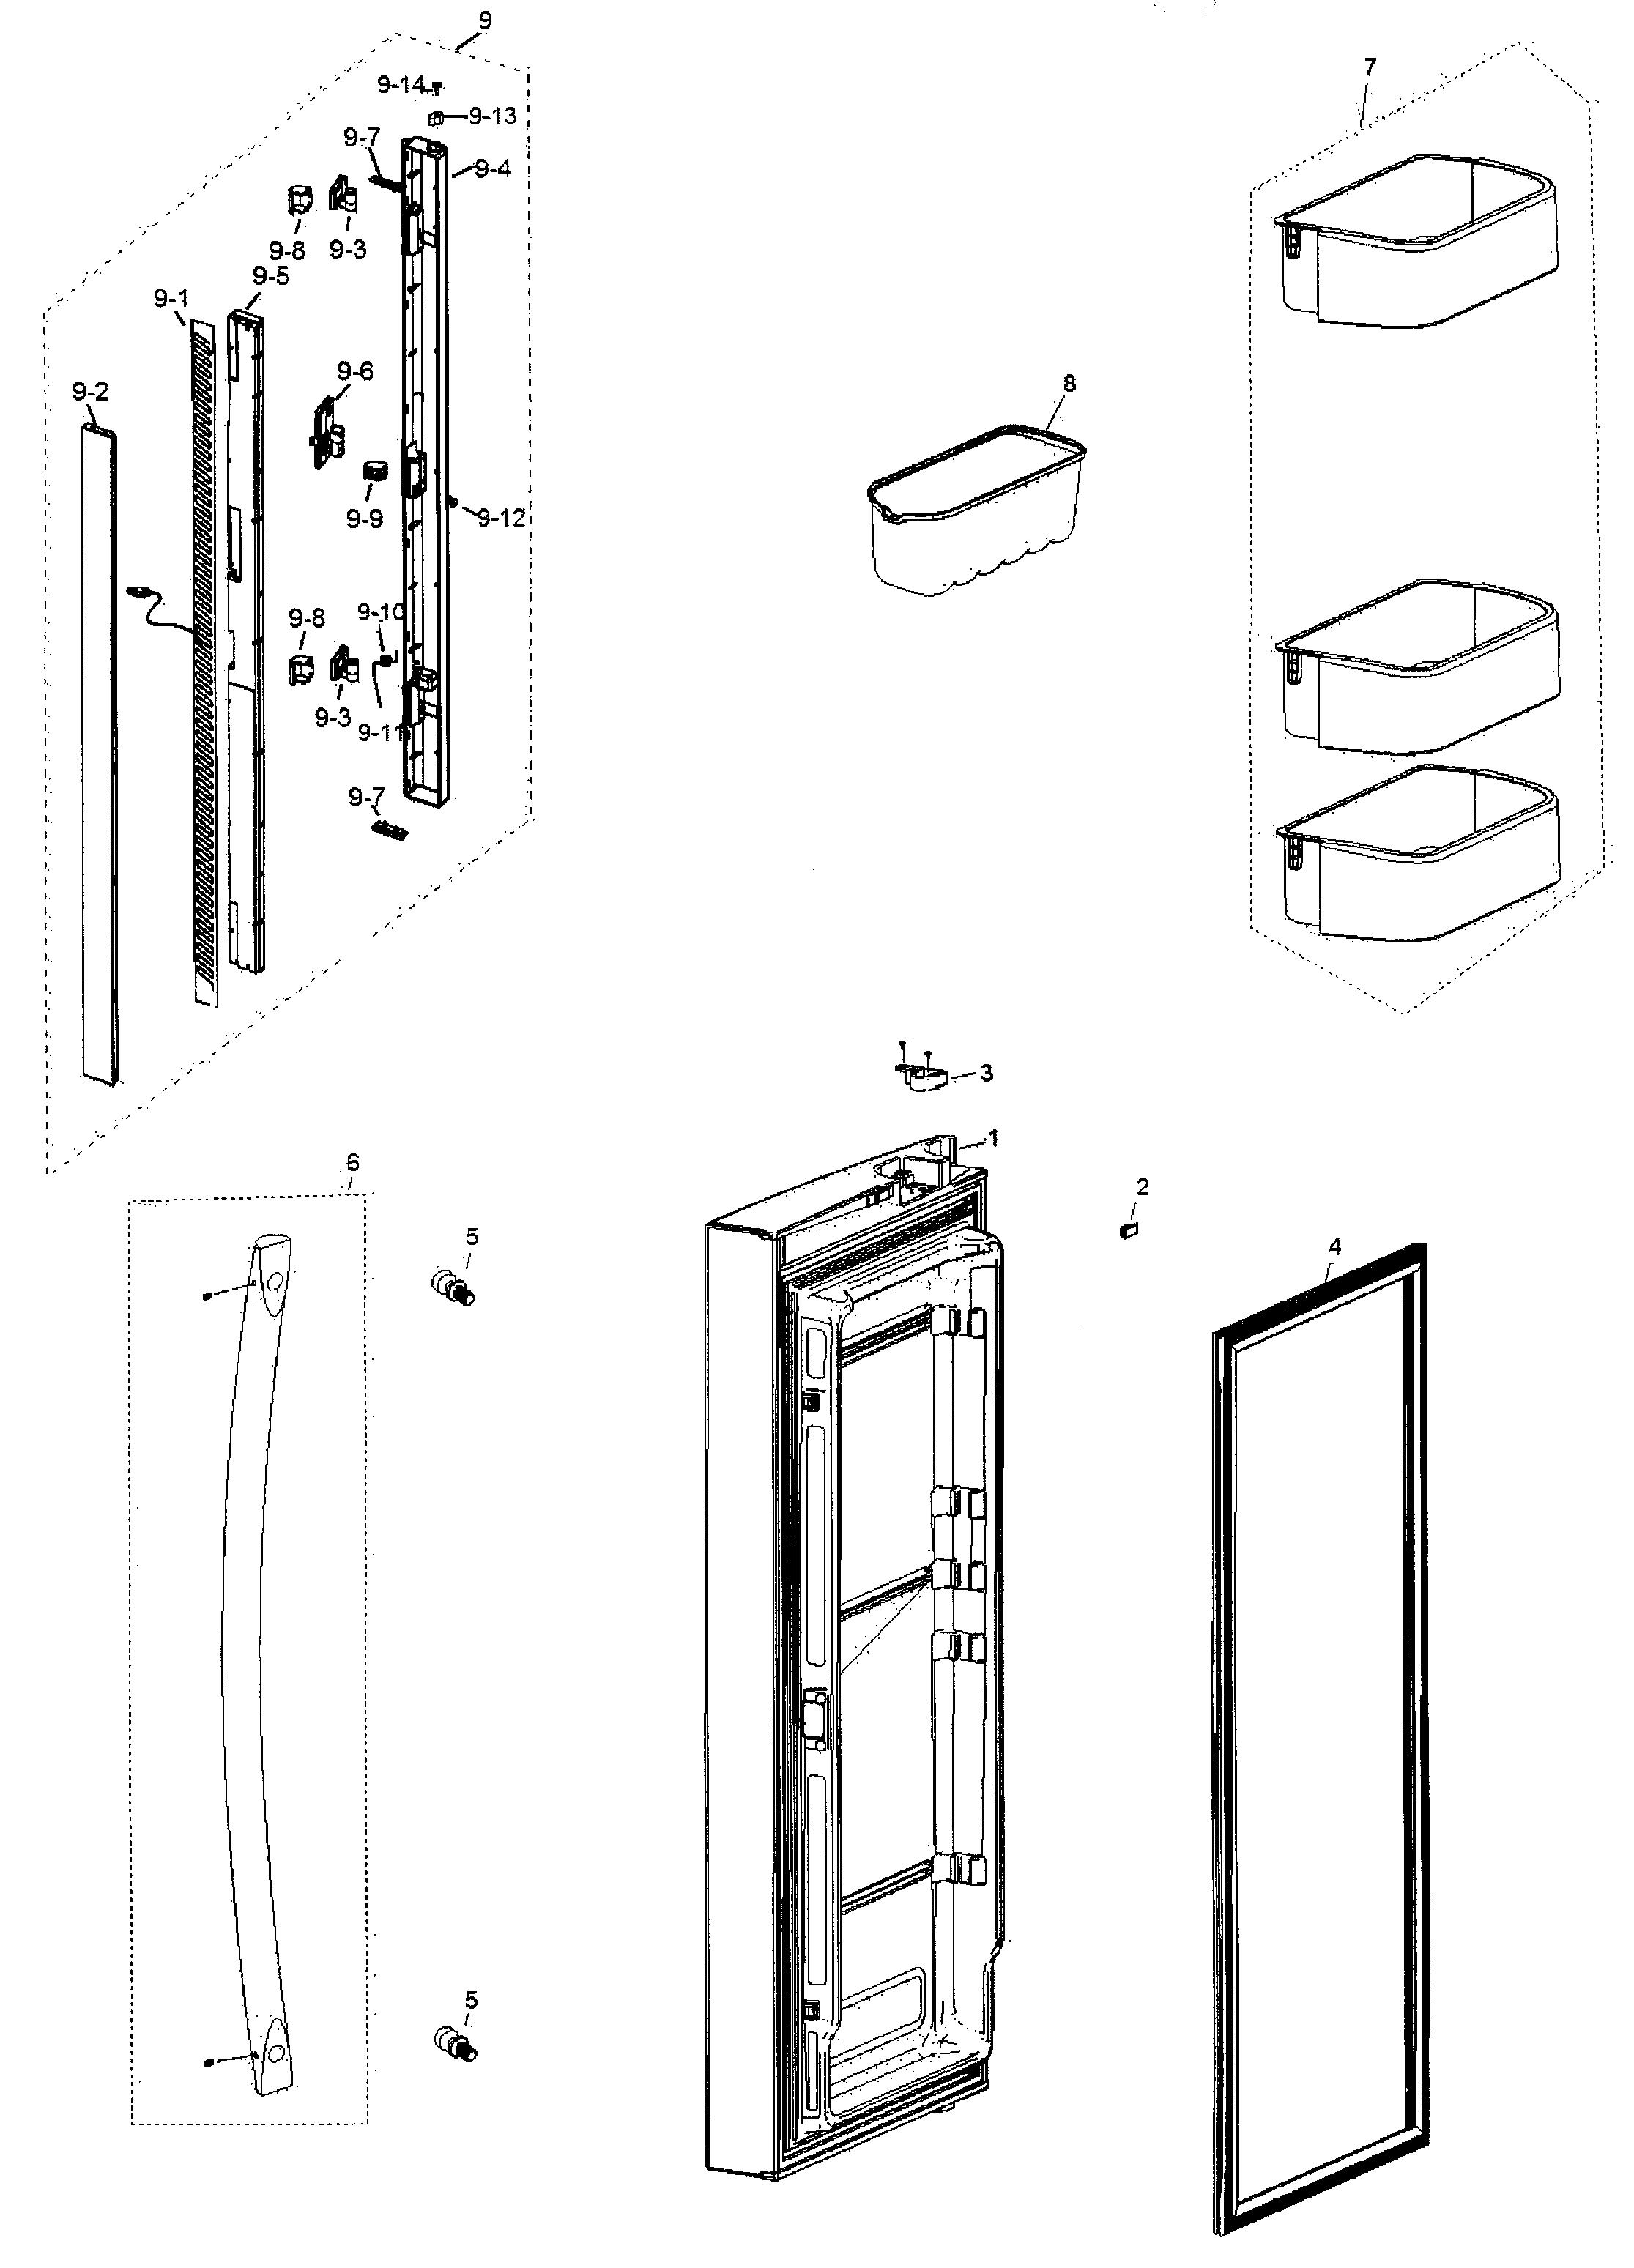 LZ_4511] Wiring Samsung Diagram Refrigerator Rb217A Free Diagram | Wiring Samsung Diagram Refrigerator Rb217a |  | Nizat Dext Hylec Gho Vira Mohammedshrine Librar Wiring 101